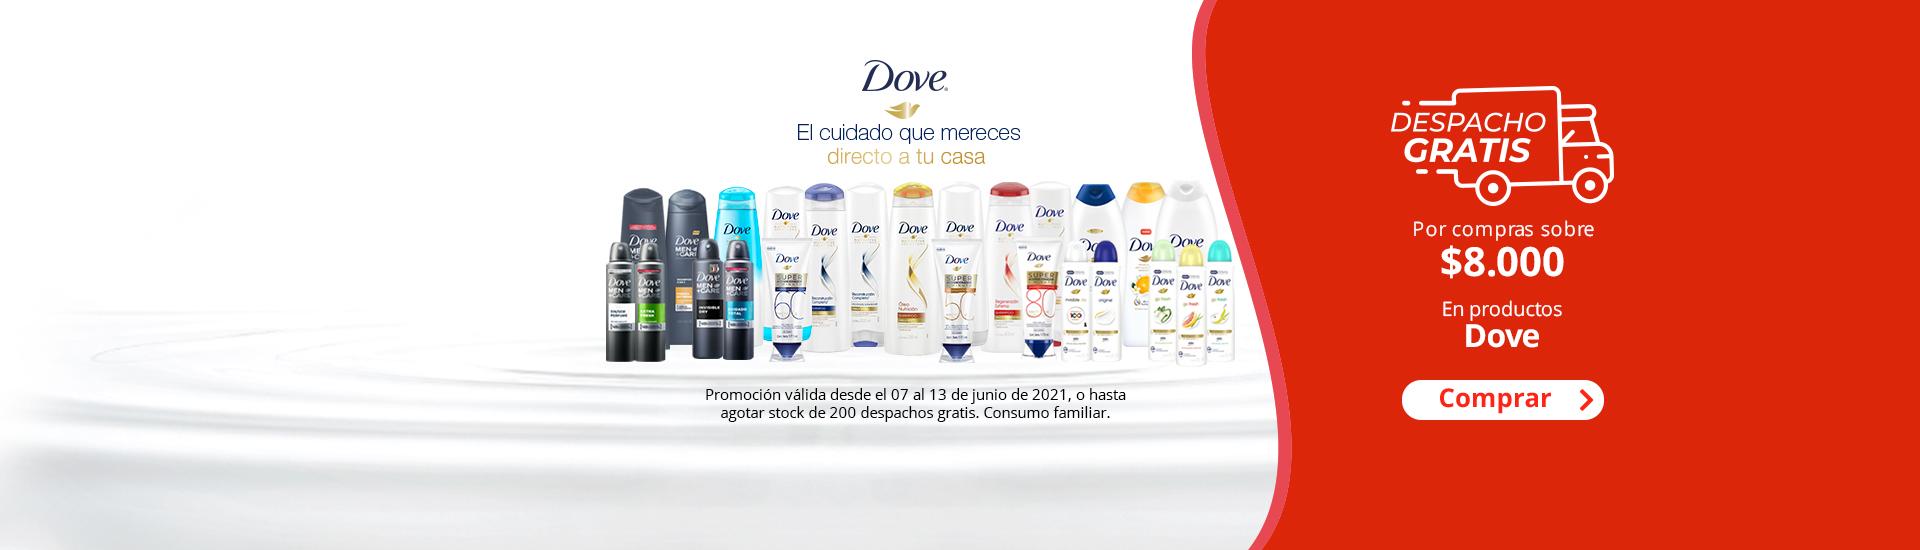 DG Unilever alimentos